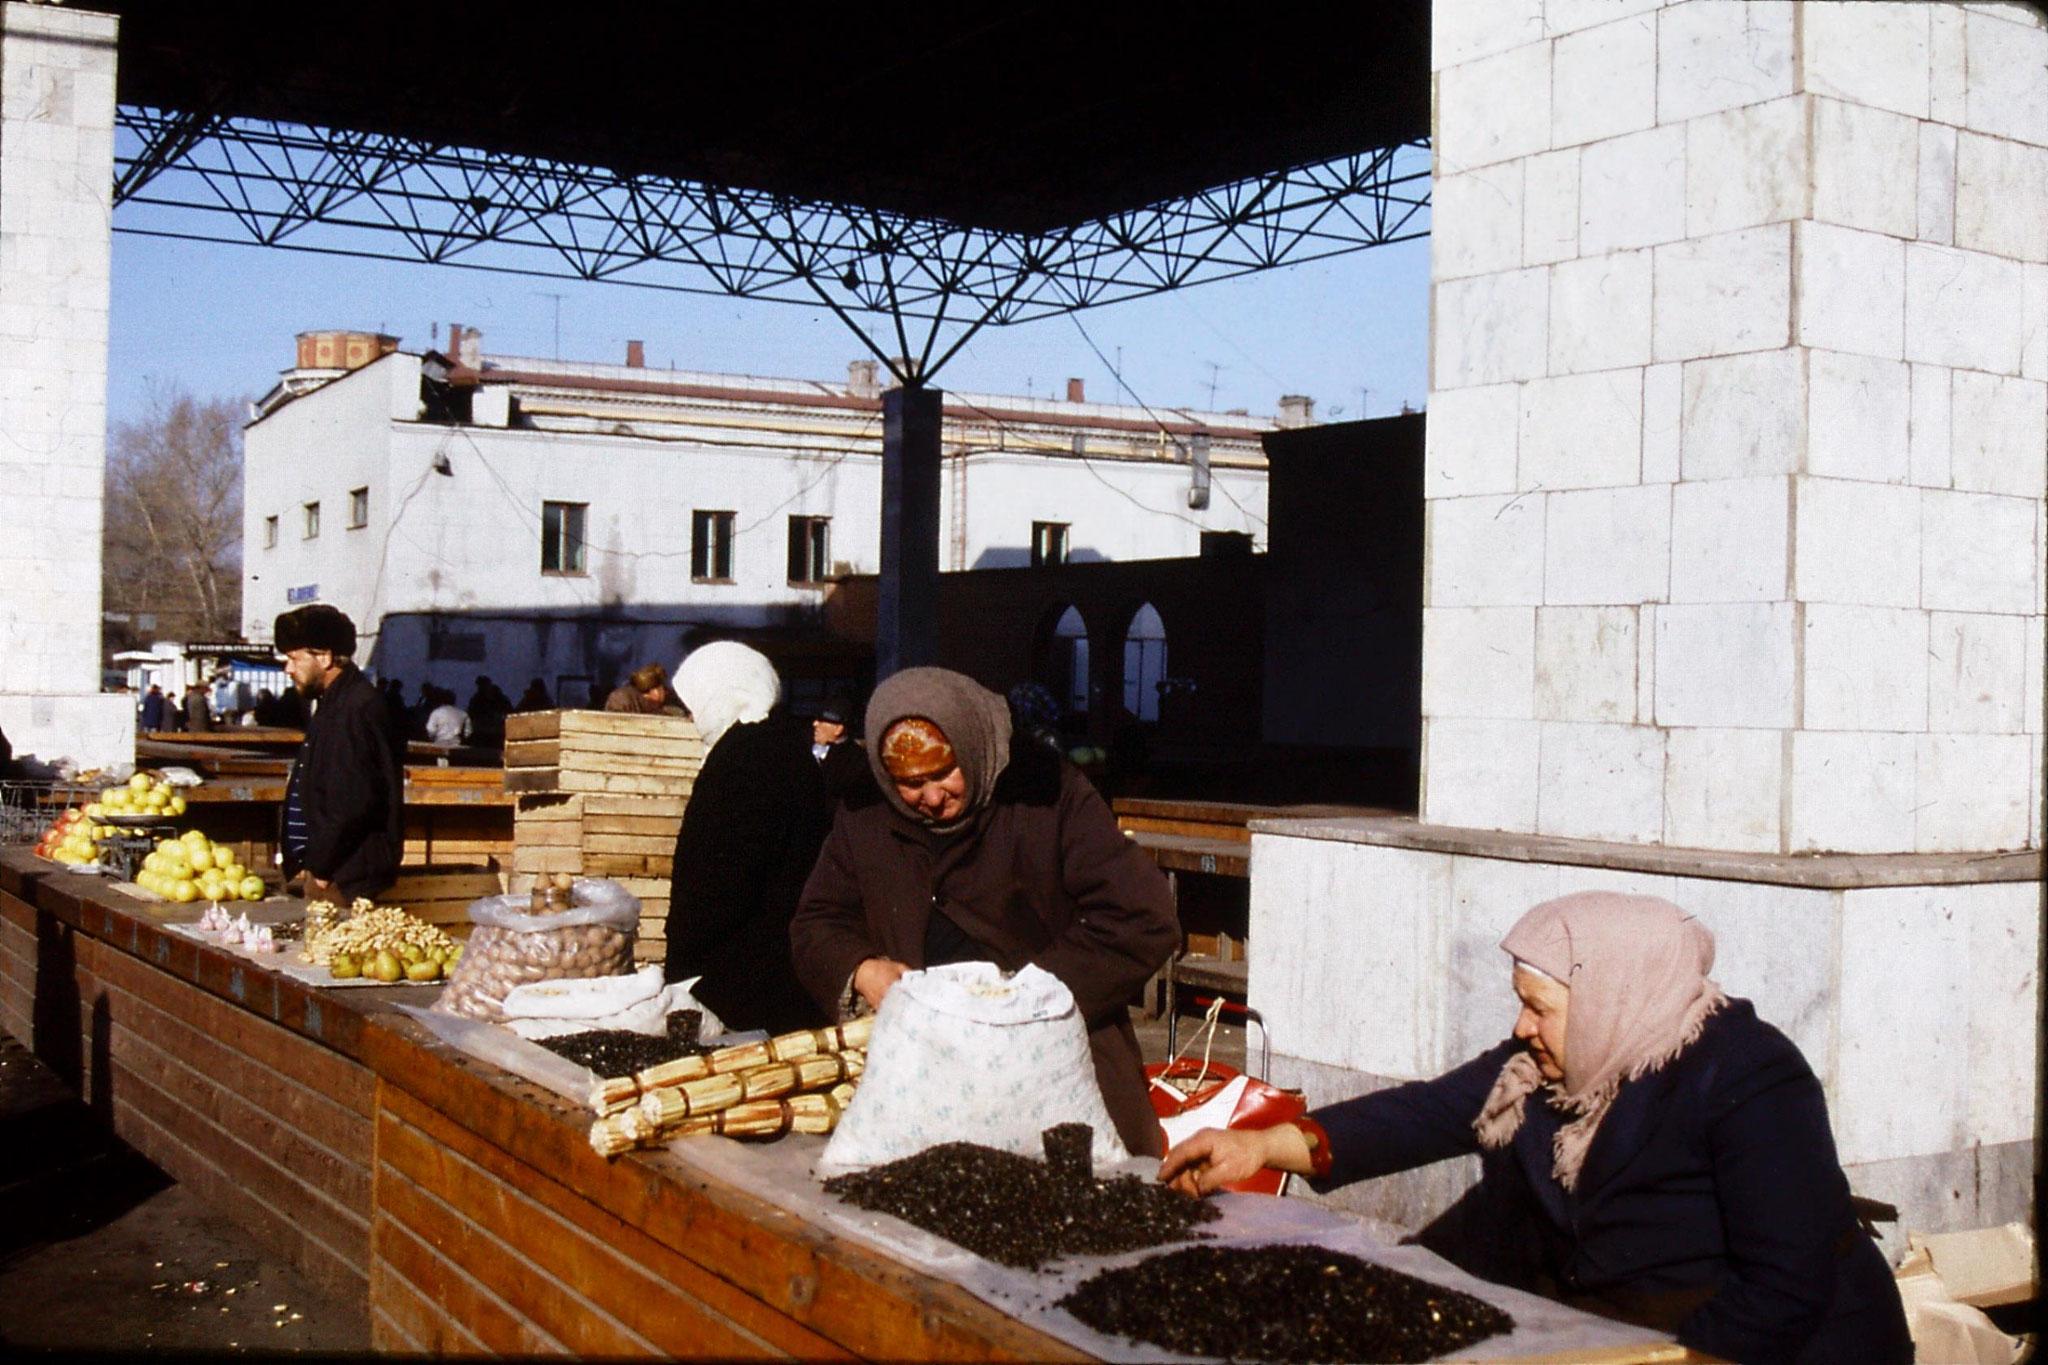 24/10/1988: 35: Irkutsk vegetable market